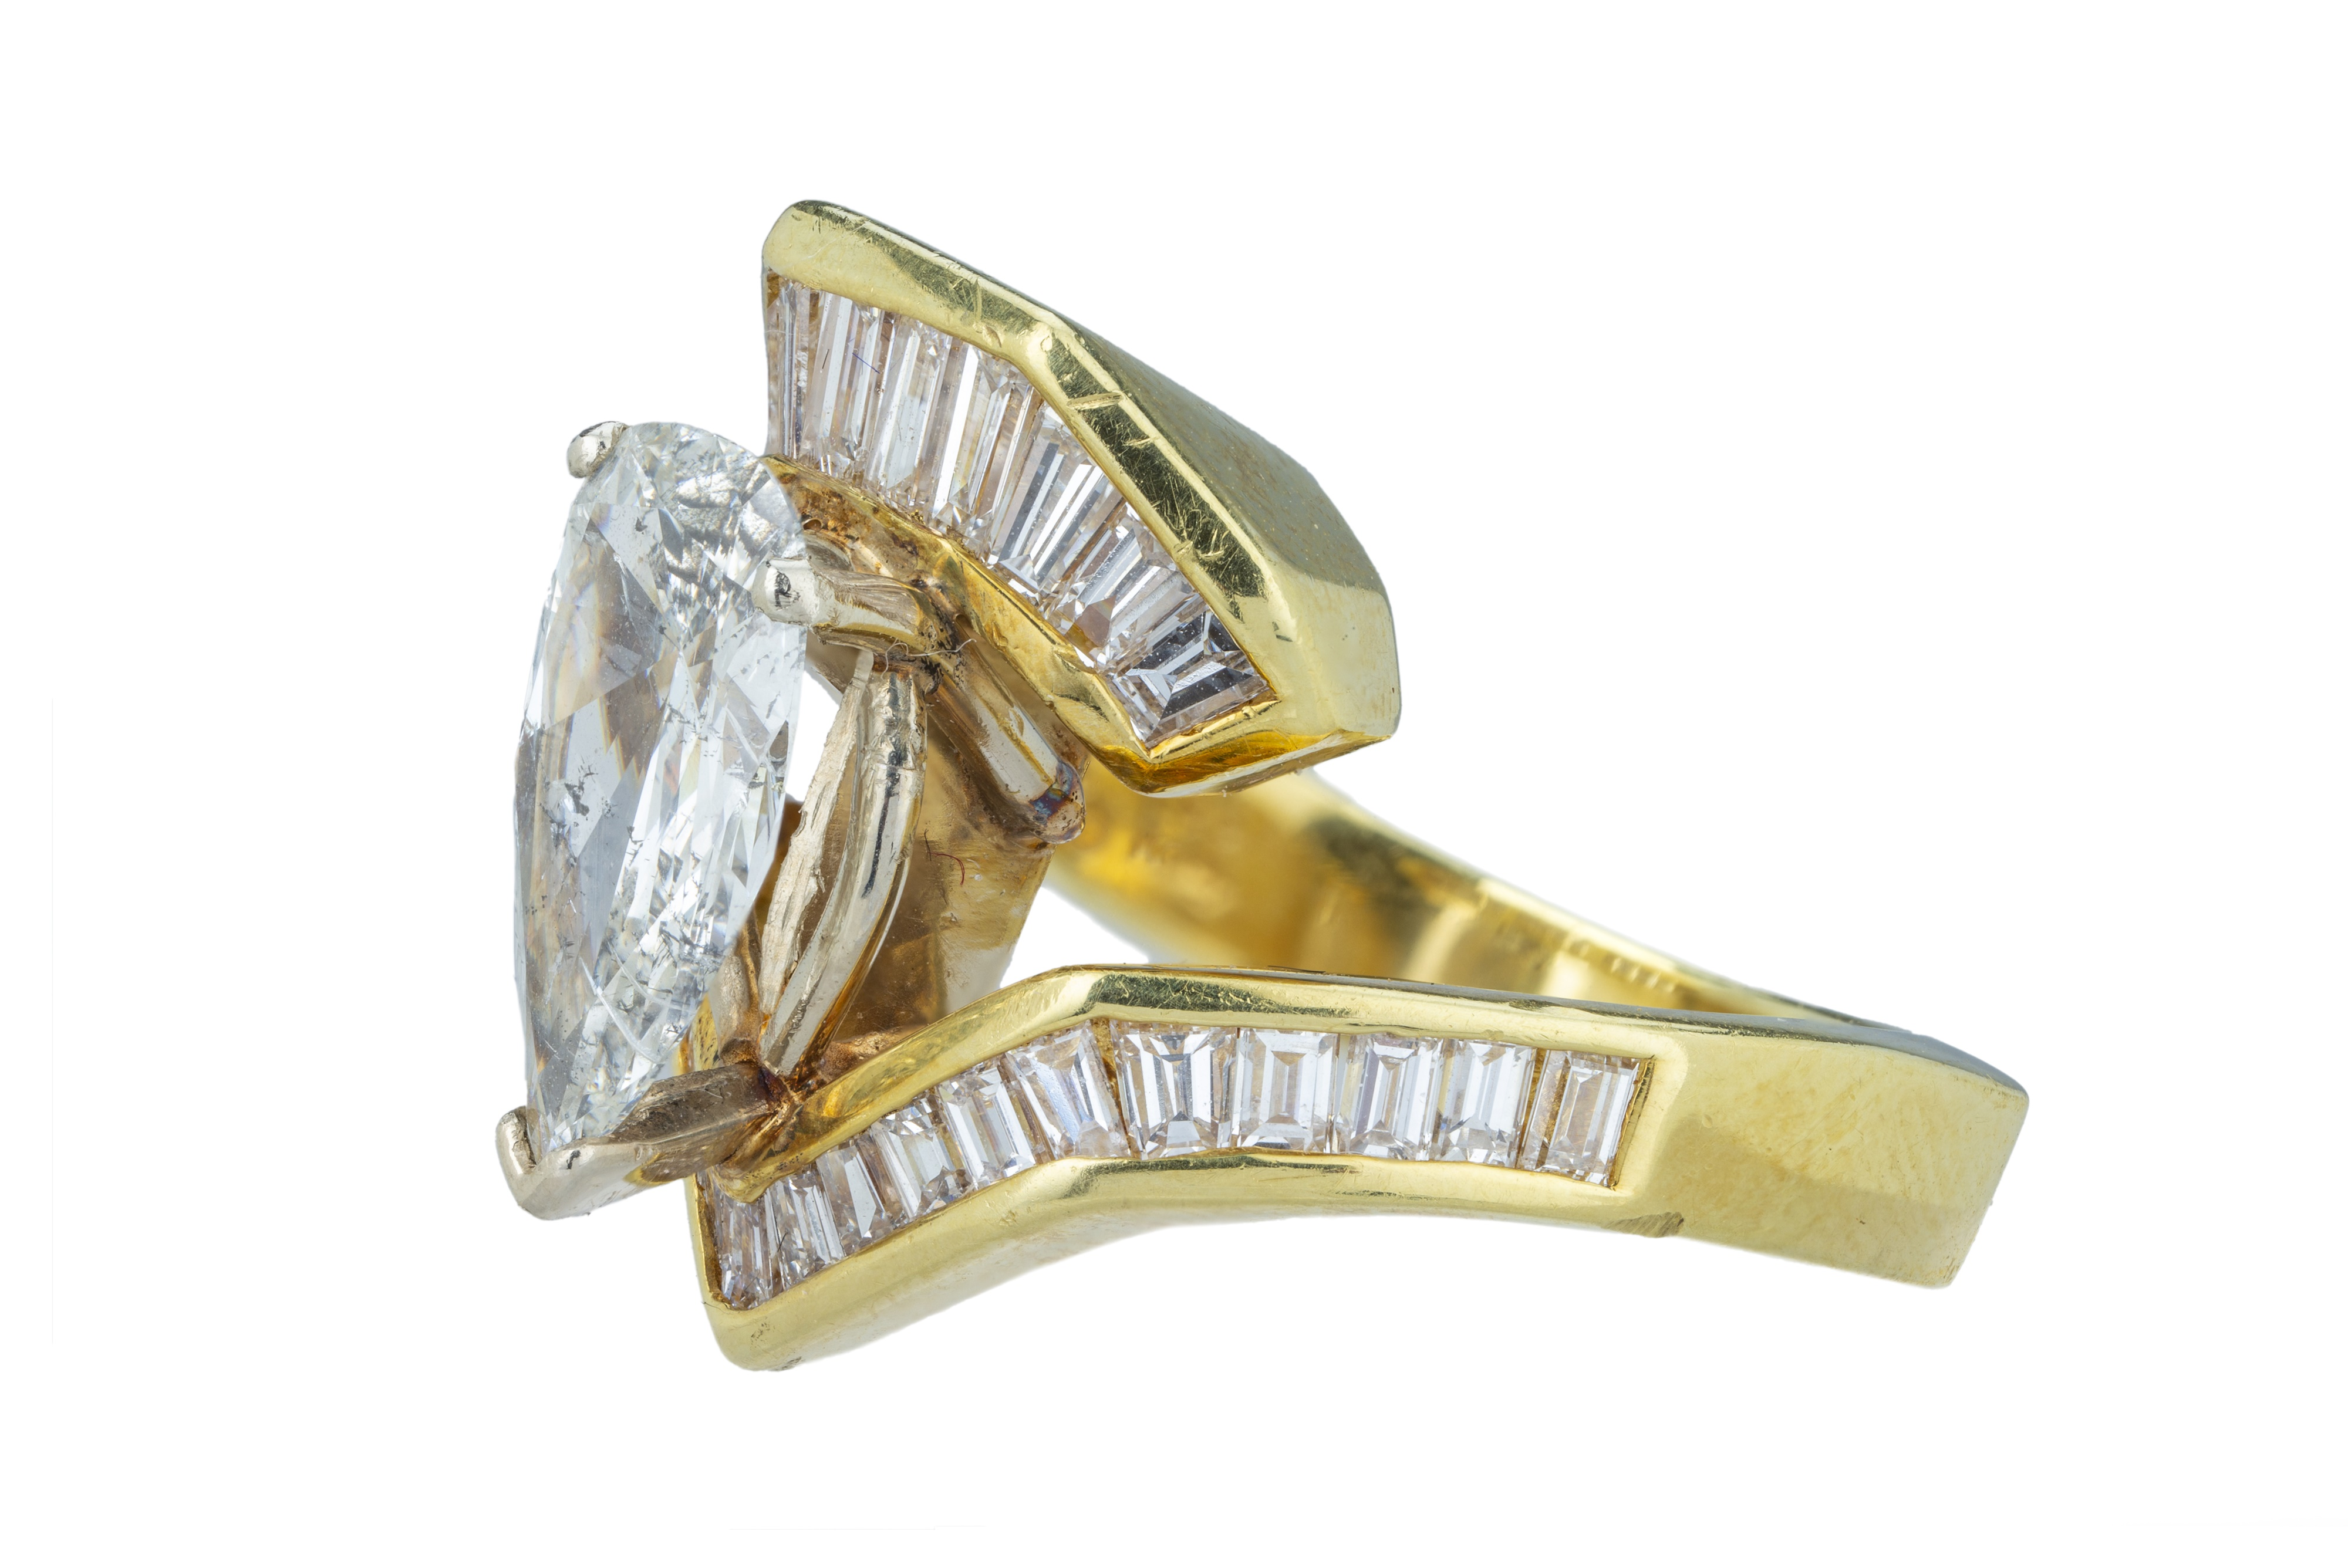 A flamboyant diamond dress ring. - Image 2 of 5